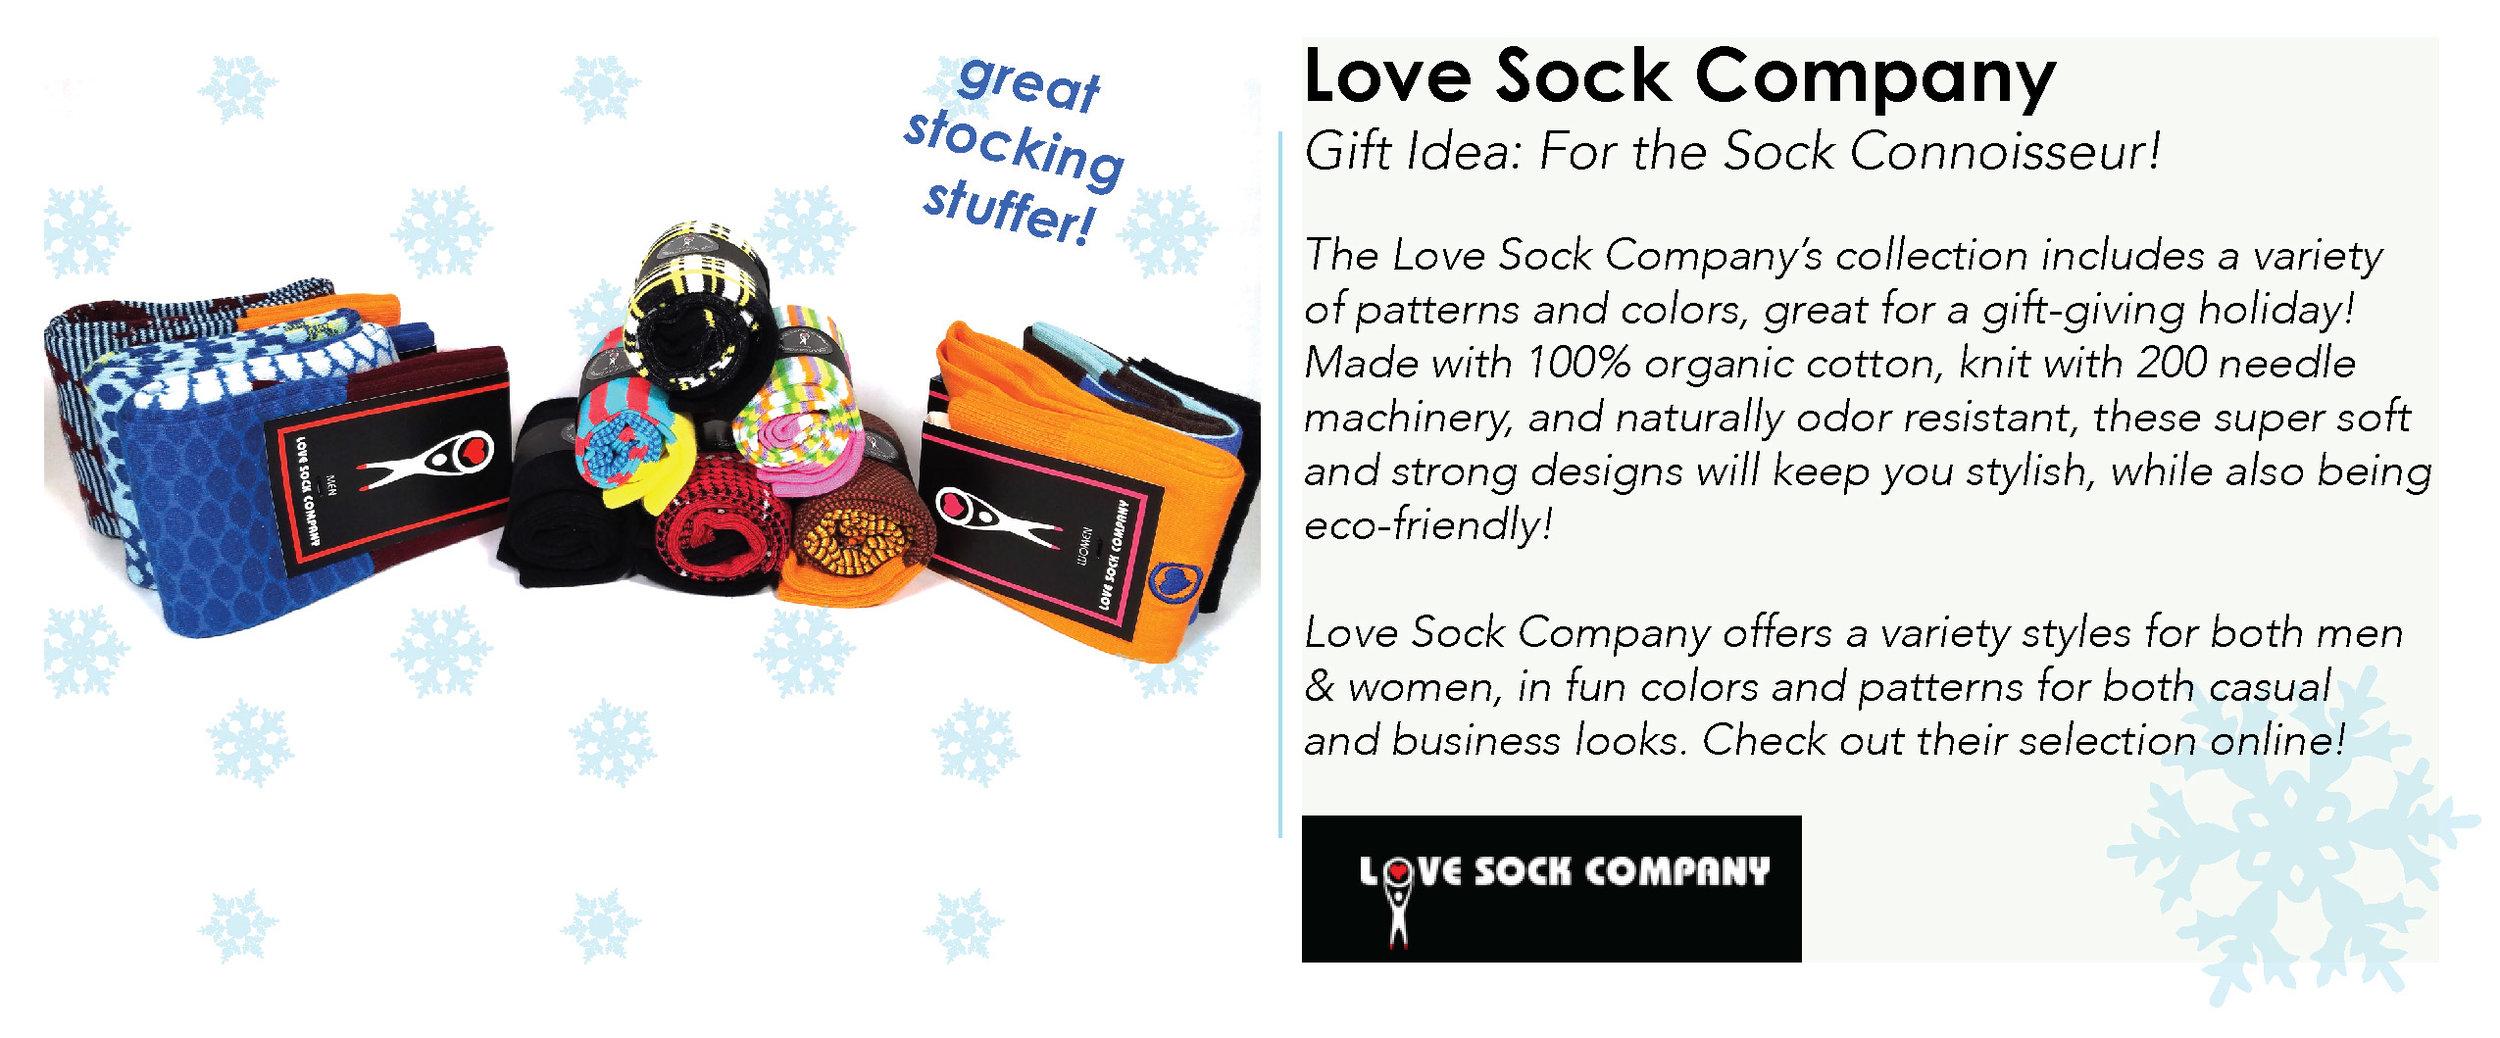 Photo Credit: Love Sock Company - Shop the Look:  Love Sock Company Website